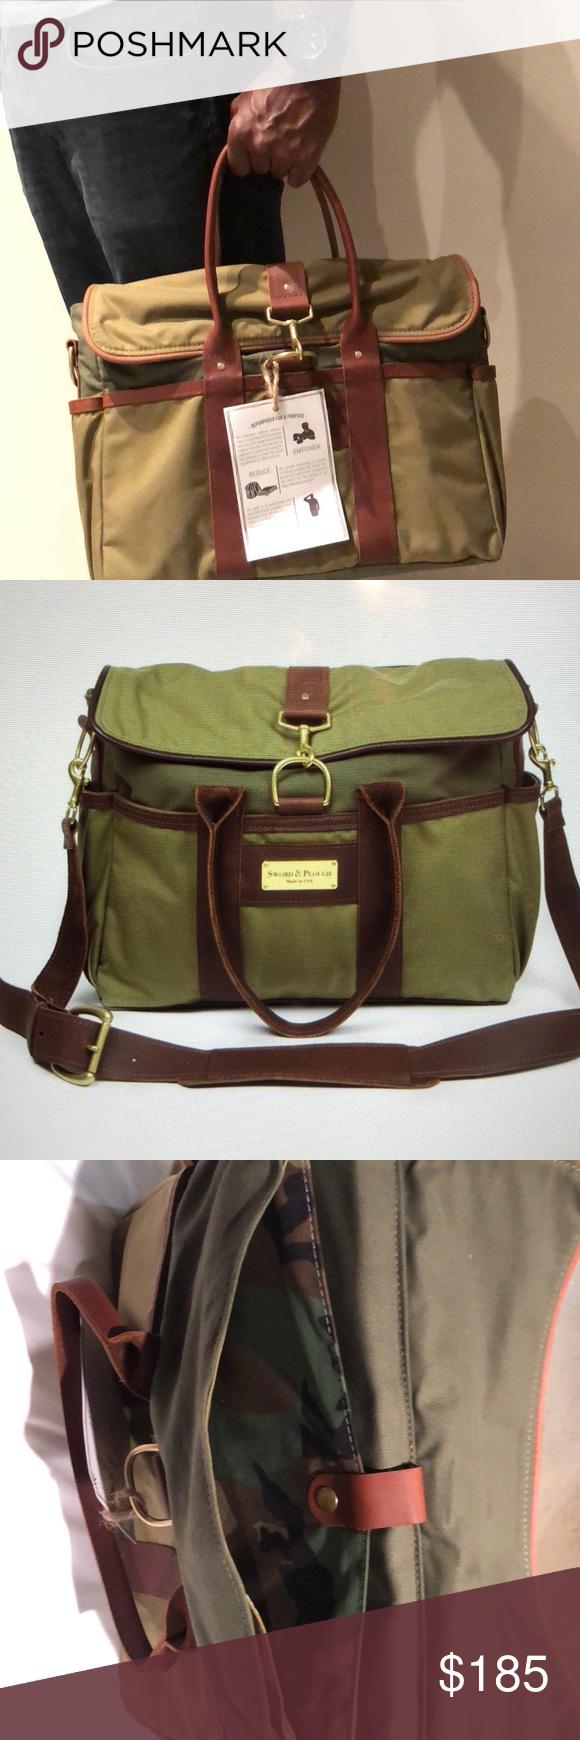 ffb5988eb8f62 Sword   Plow Green Signature Messenger Bag Green messenger bag with nylon  fabric and full grain